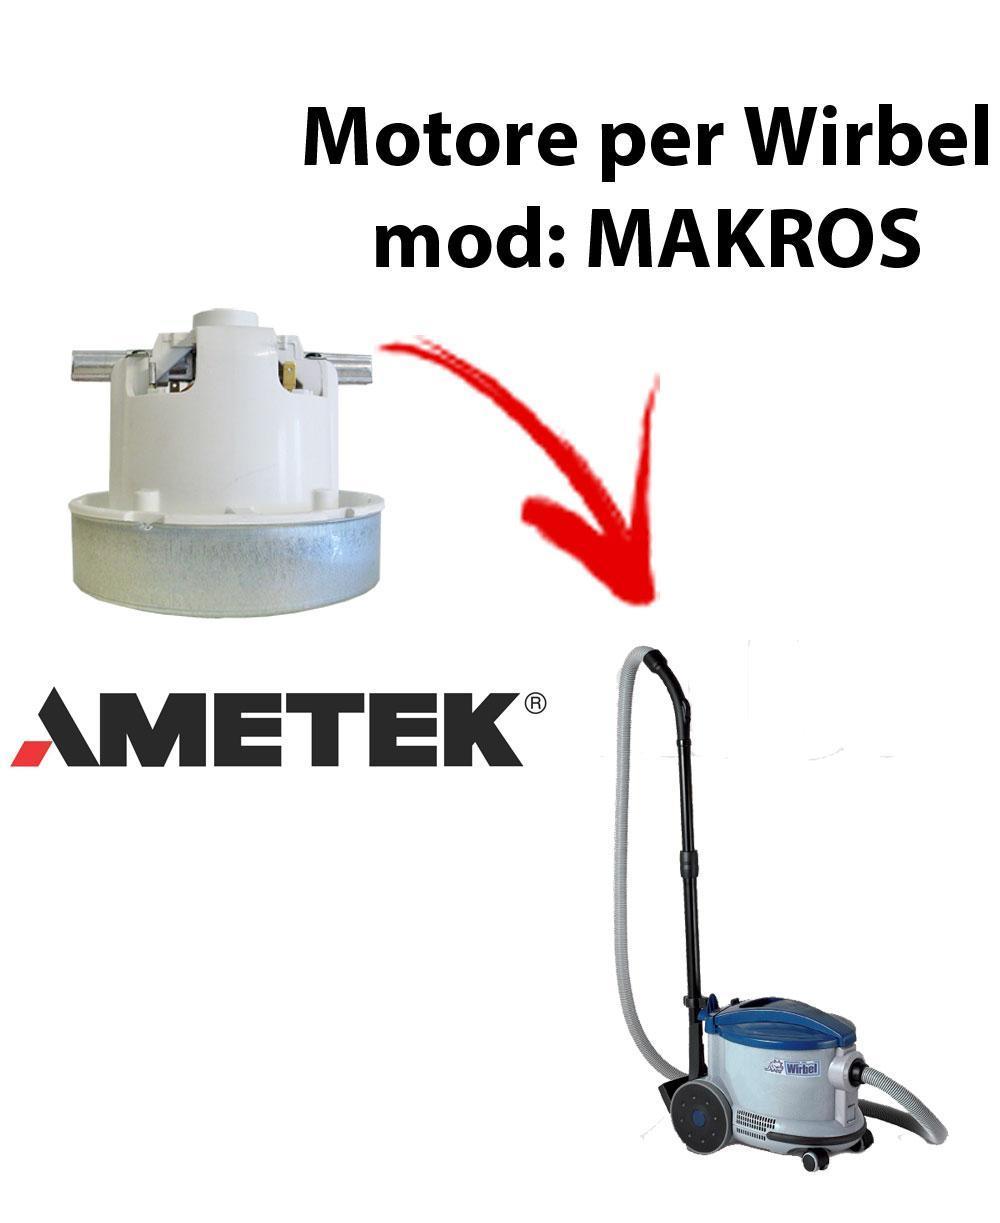 MAKROS  MOTEUR ASPIRATION AMETEK pour aspirateur WIRBEL